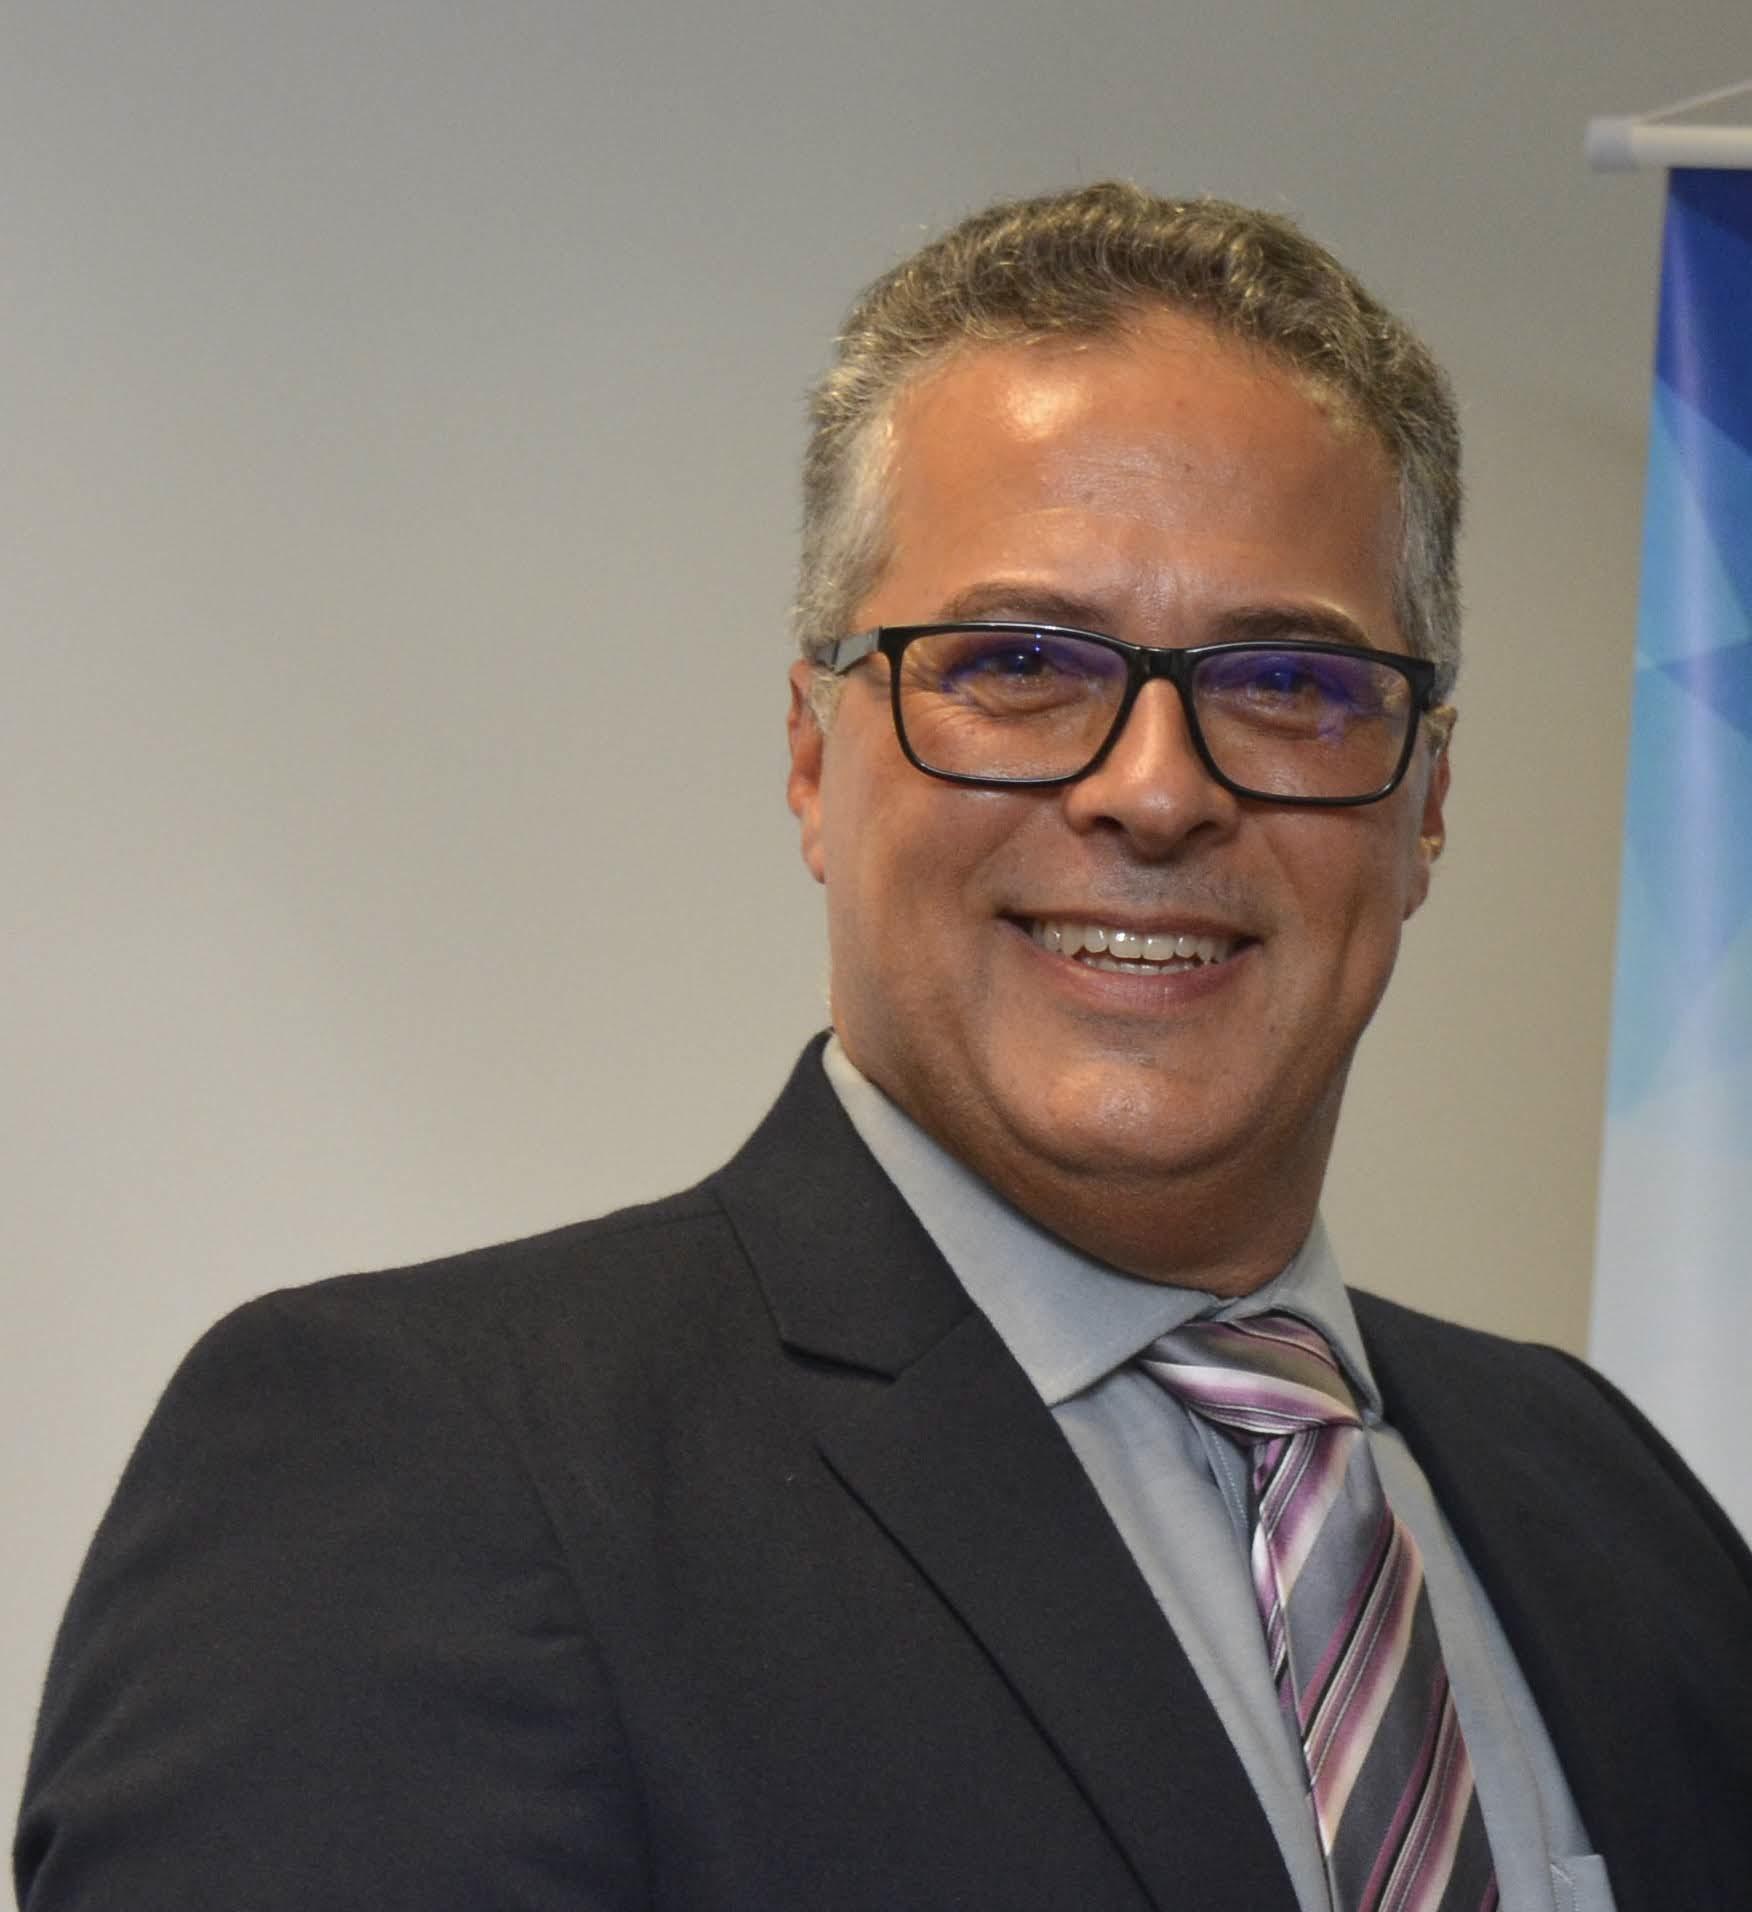 Fernando Antonio Machado